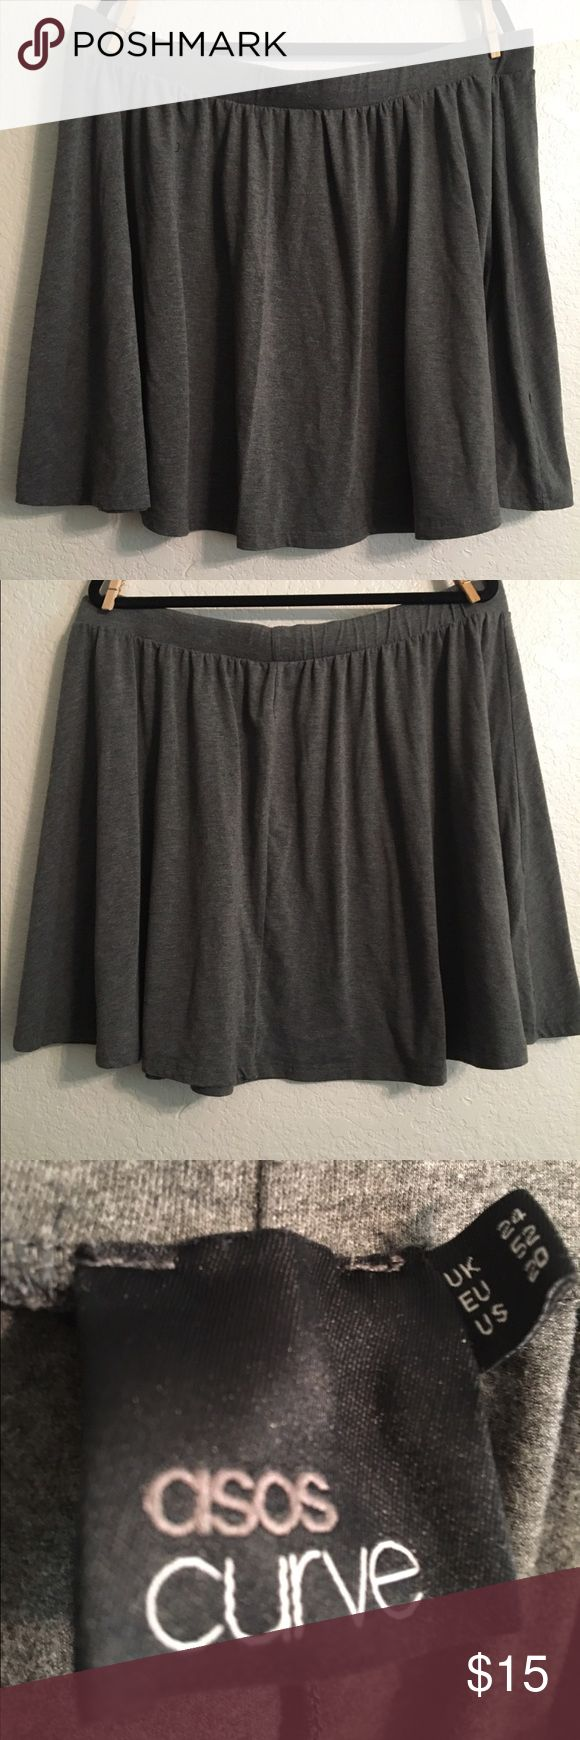 Asos Curve Grey Skater Mini Skirt Asos Curve Grey Skater Mini Skirt, Knit, Smoke Free and Pet Free Home ASOS Curve Skirts Mini